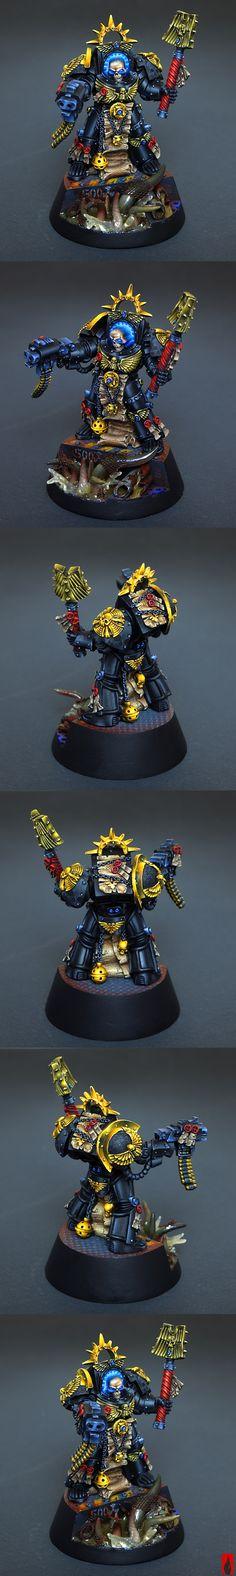 Space Marines Terminator Chaplain